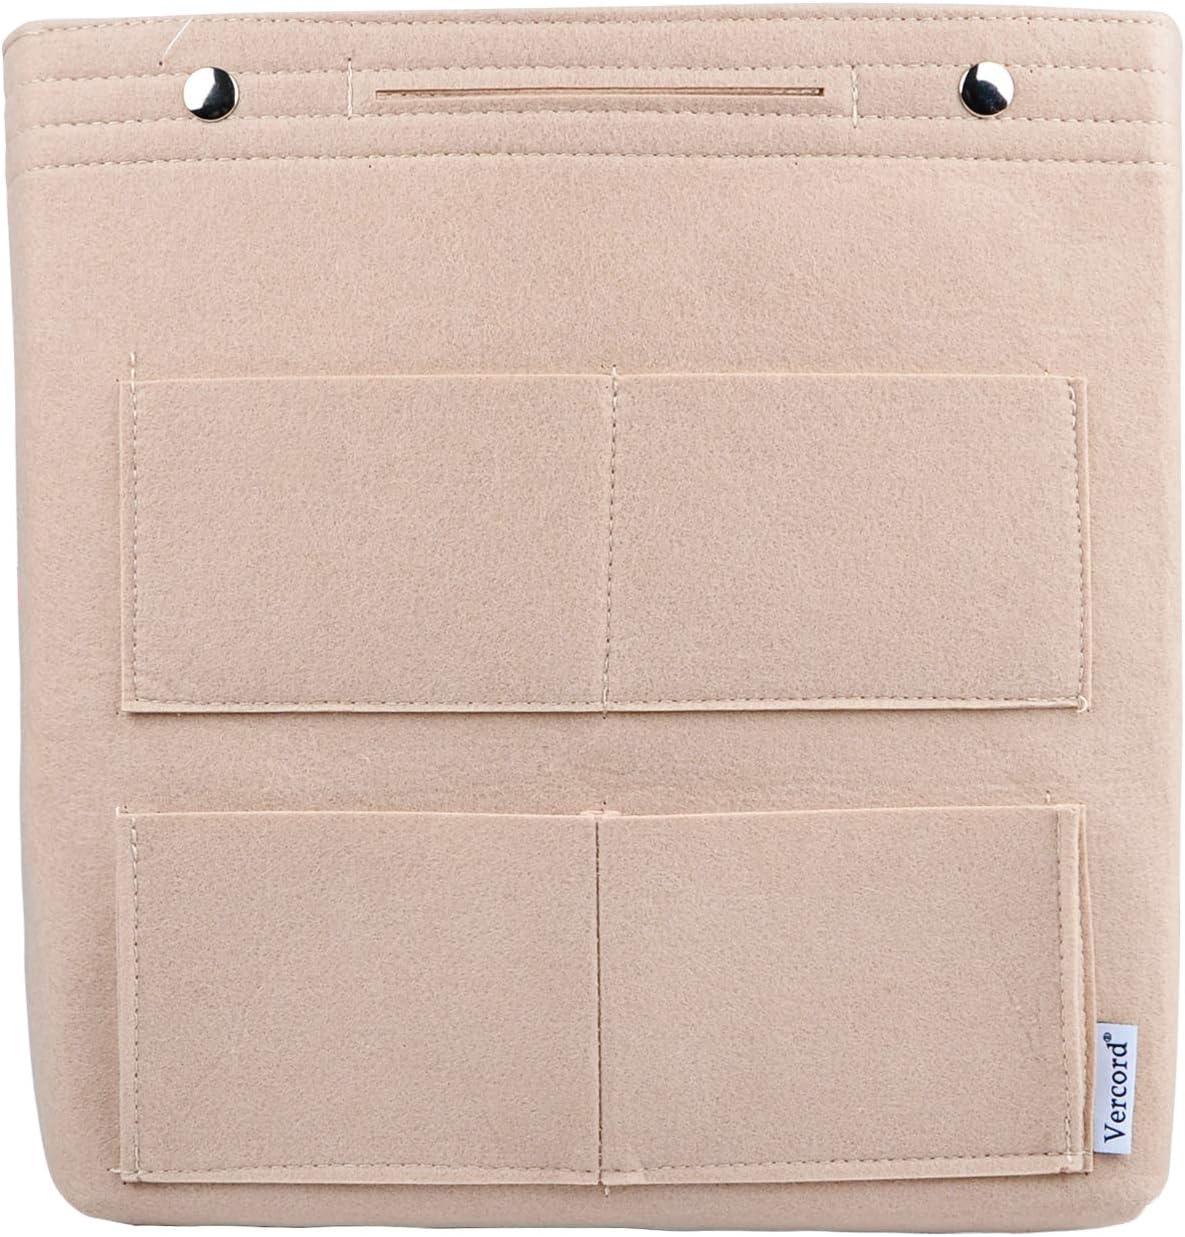 Vercord Felt Tall Long Purse Tote Backpack Bag Insert Organizer Inside for Women Cream Beige